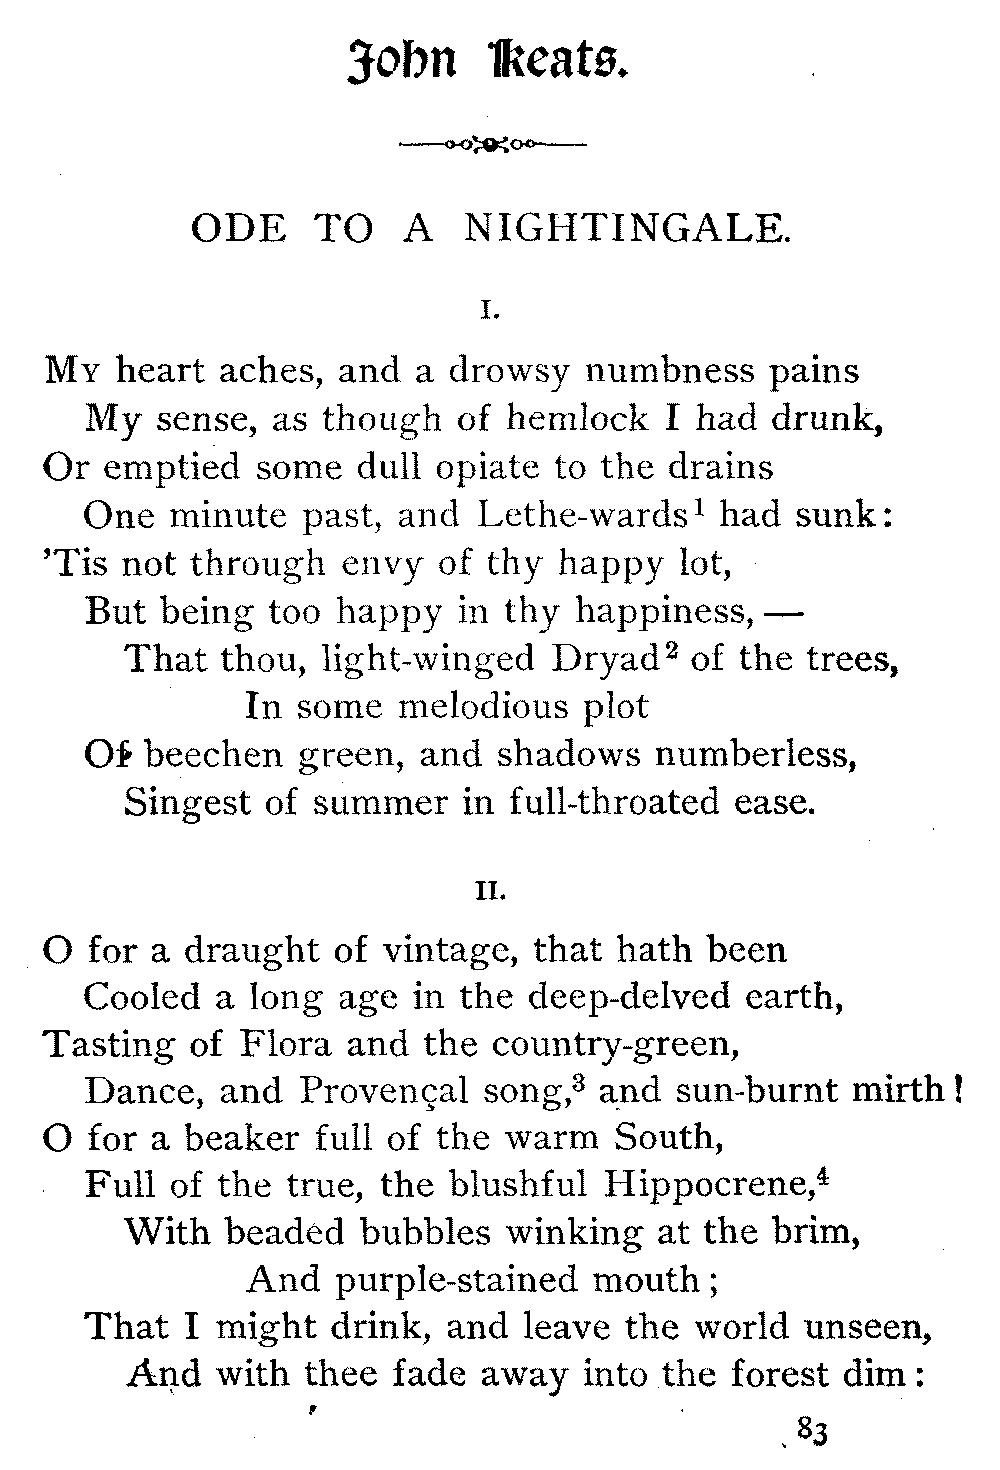 the project gutenberg ebook of six centuries of english poetry by the project gutenberg ebook of six centuries of english poetry by james baldwin